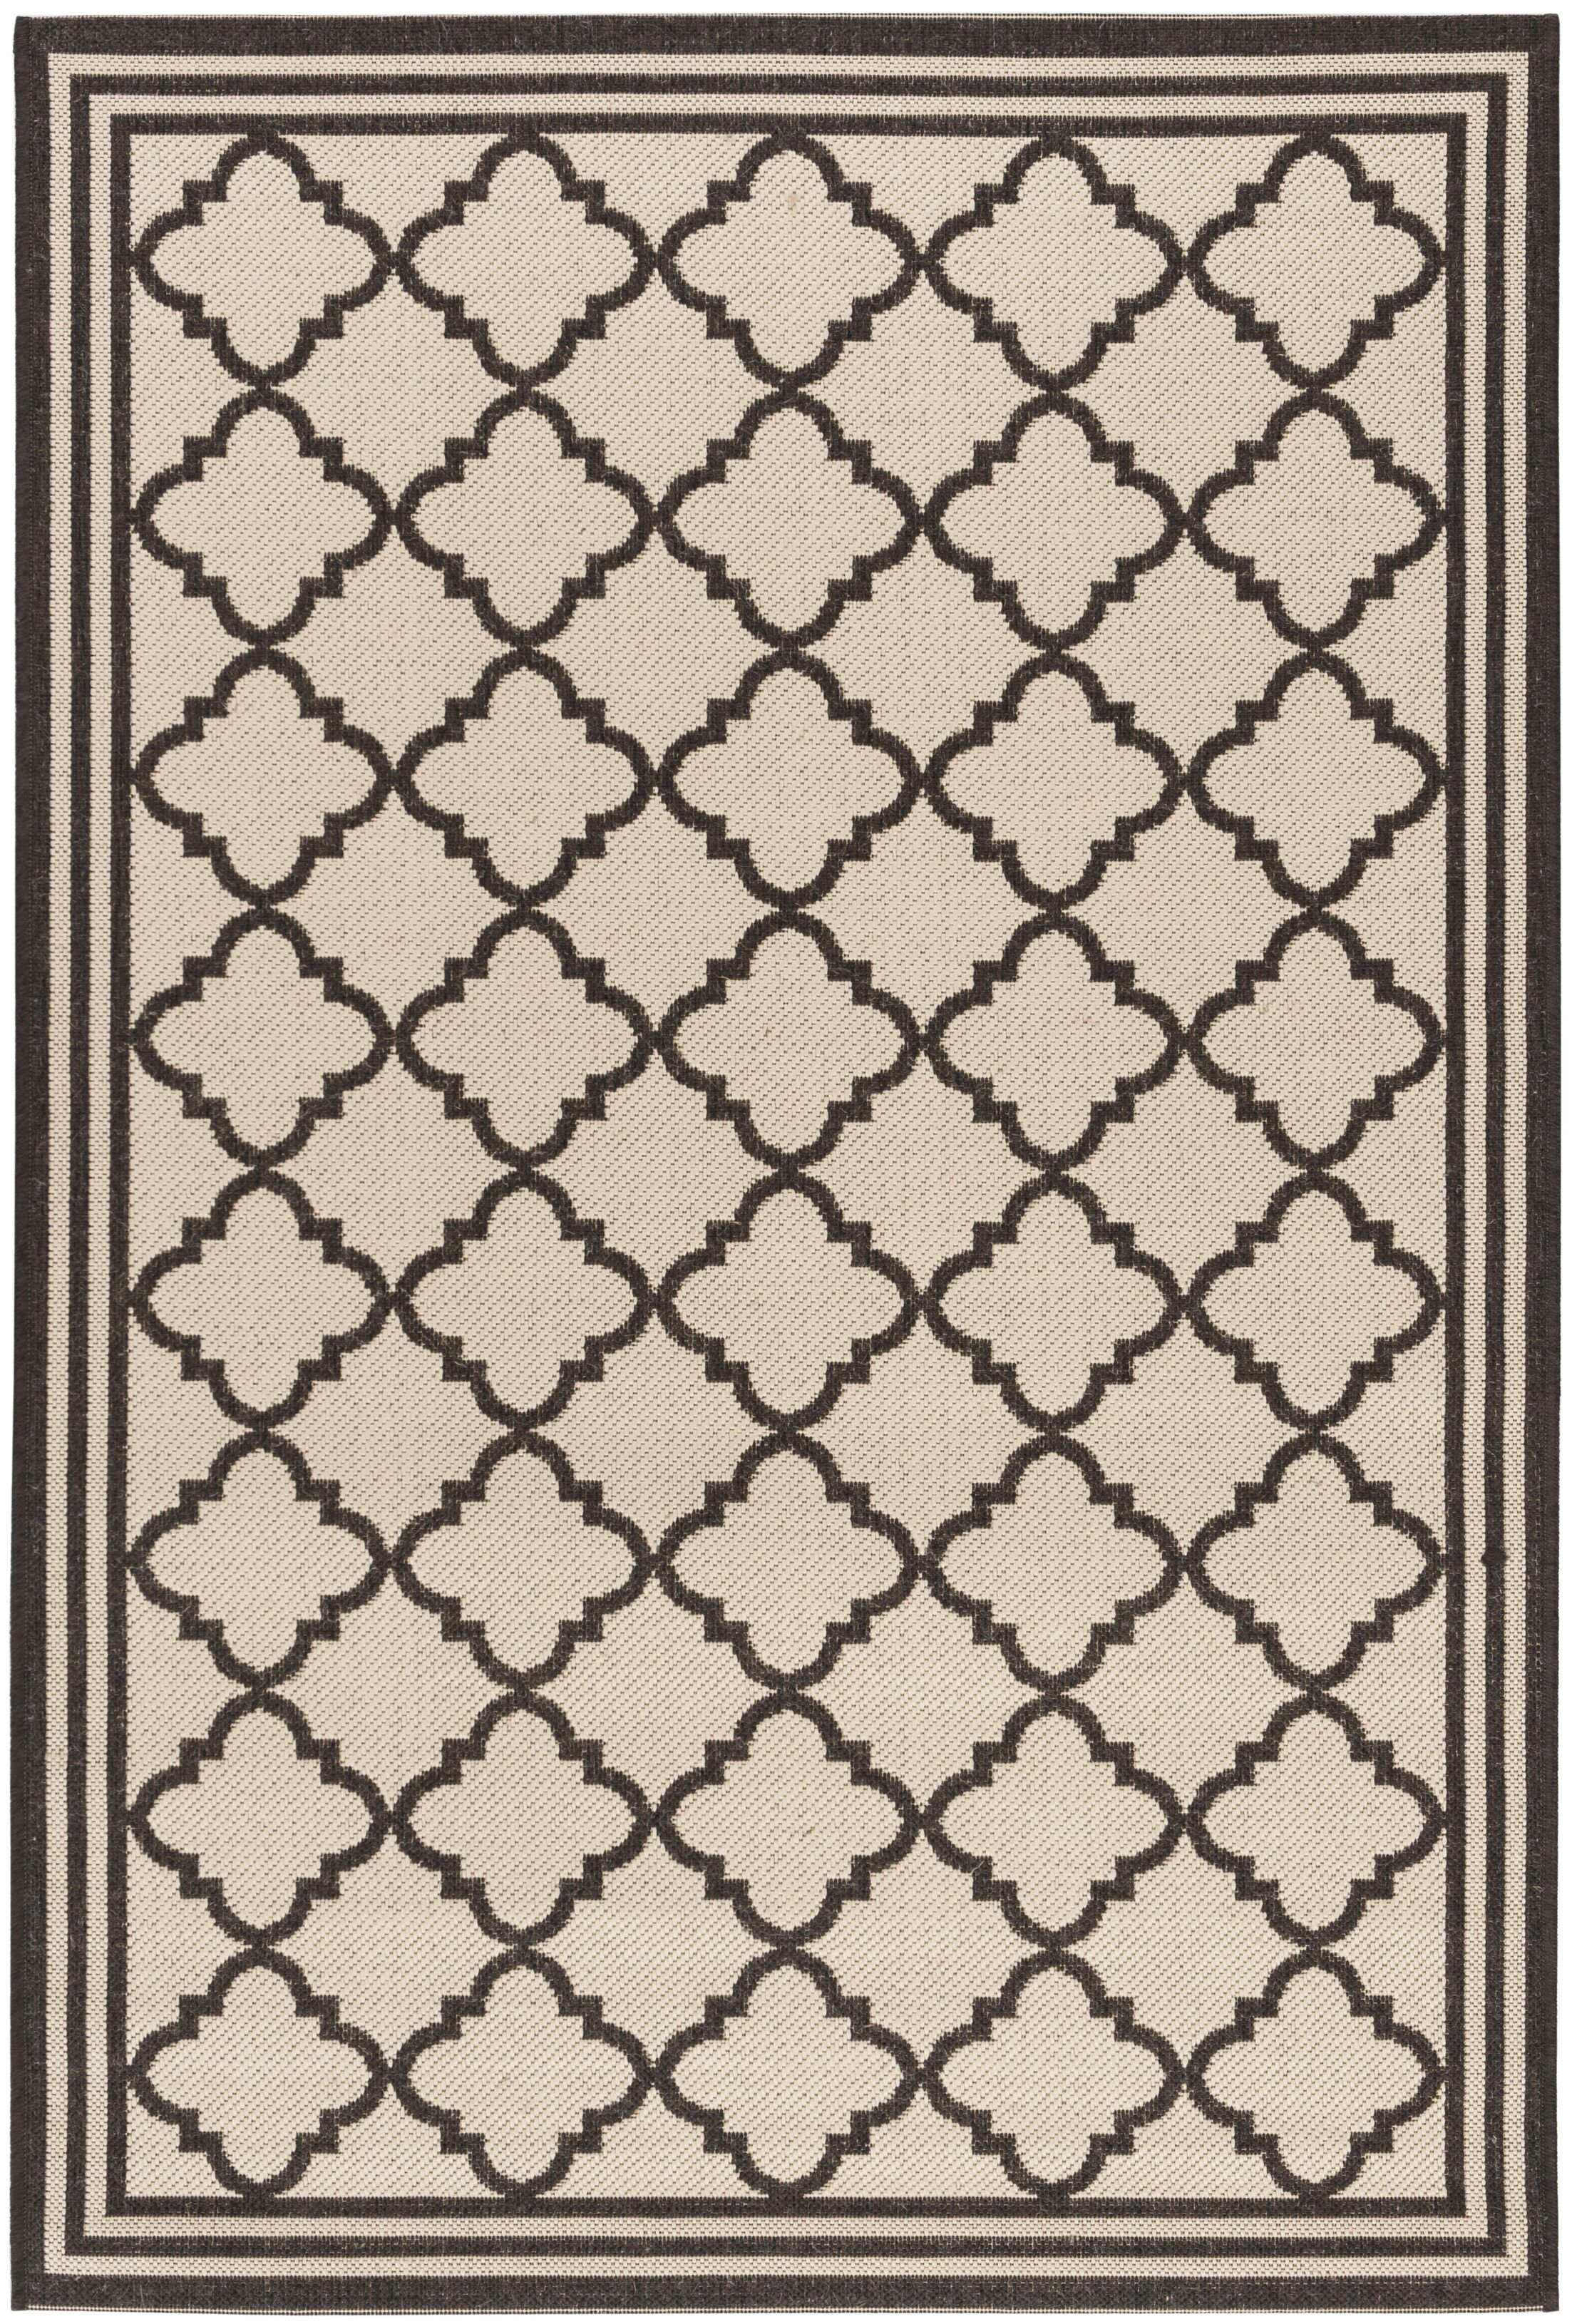 Sherell Creme/Brown Area Rug Rug Size: Rectangle 4' x 6'